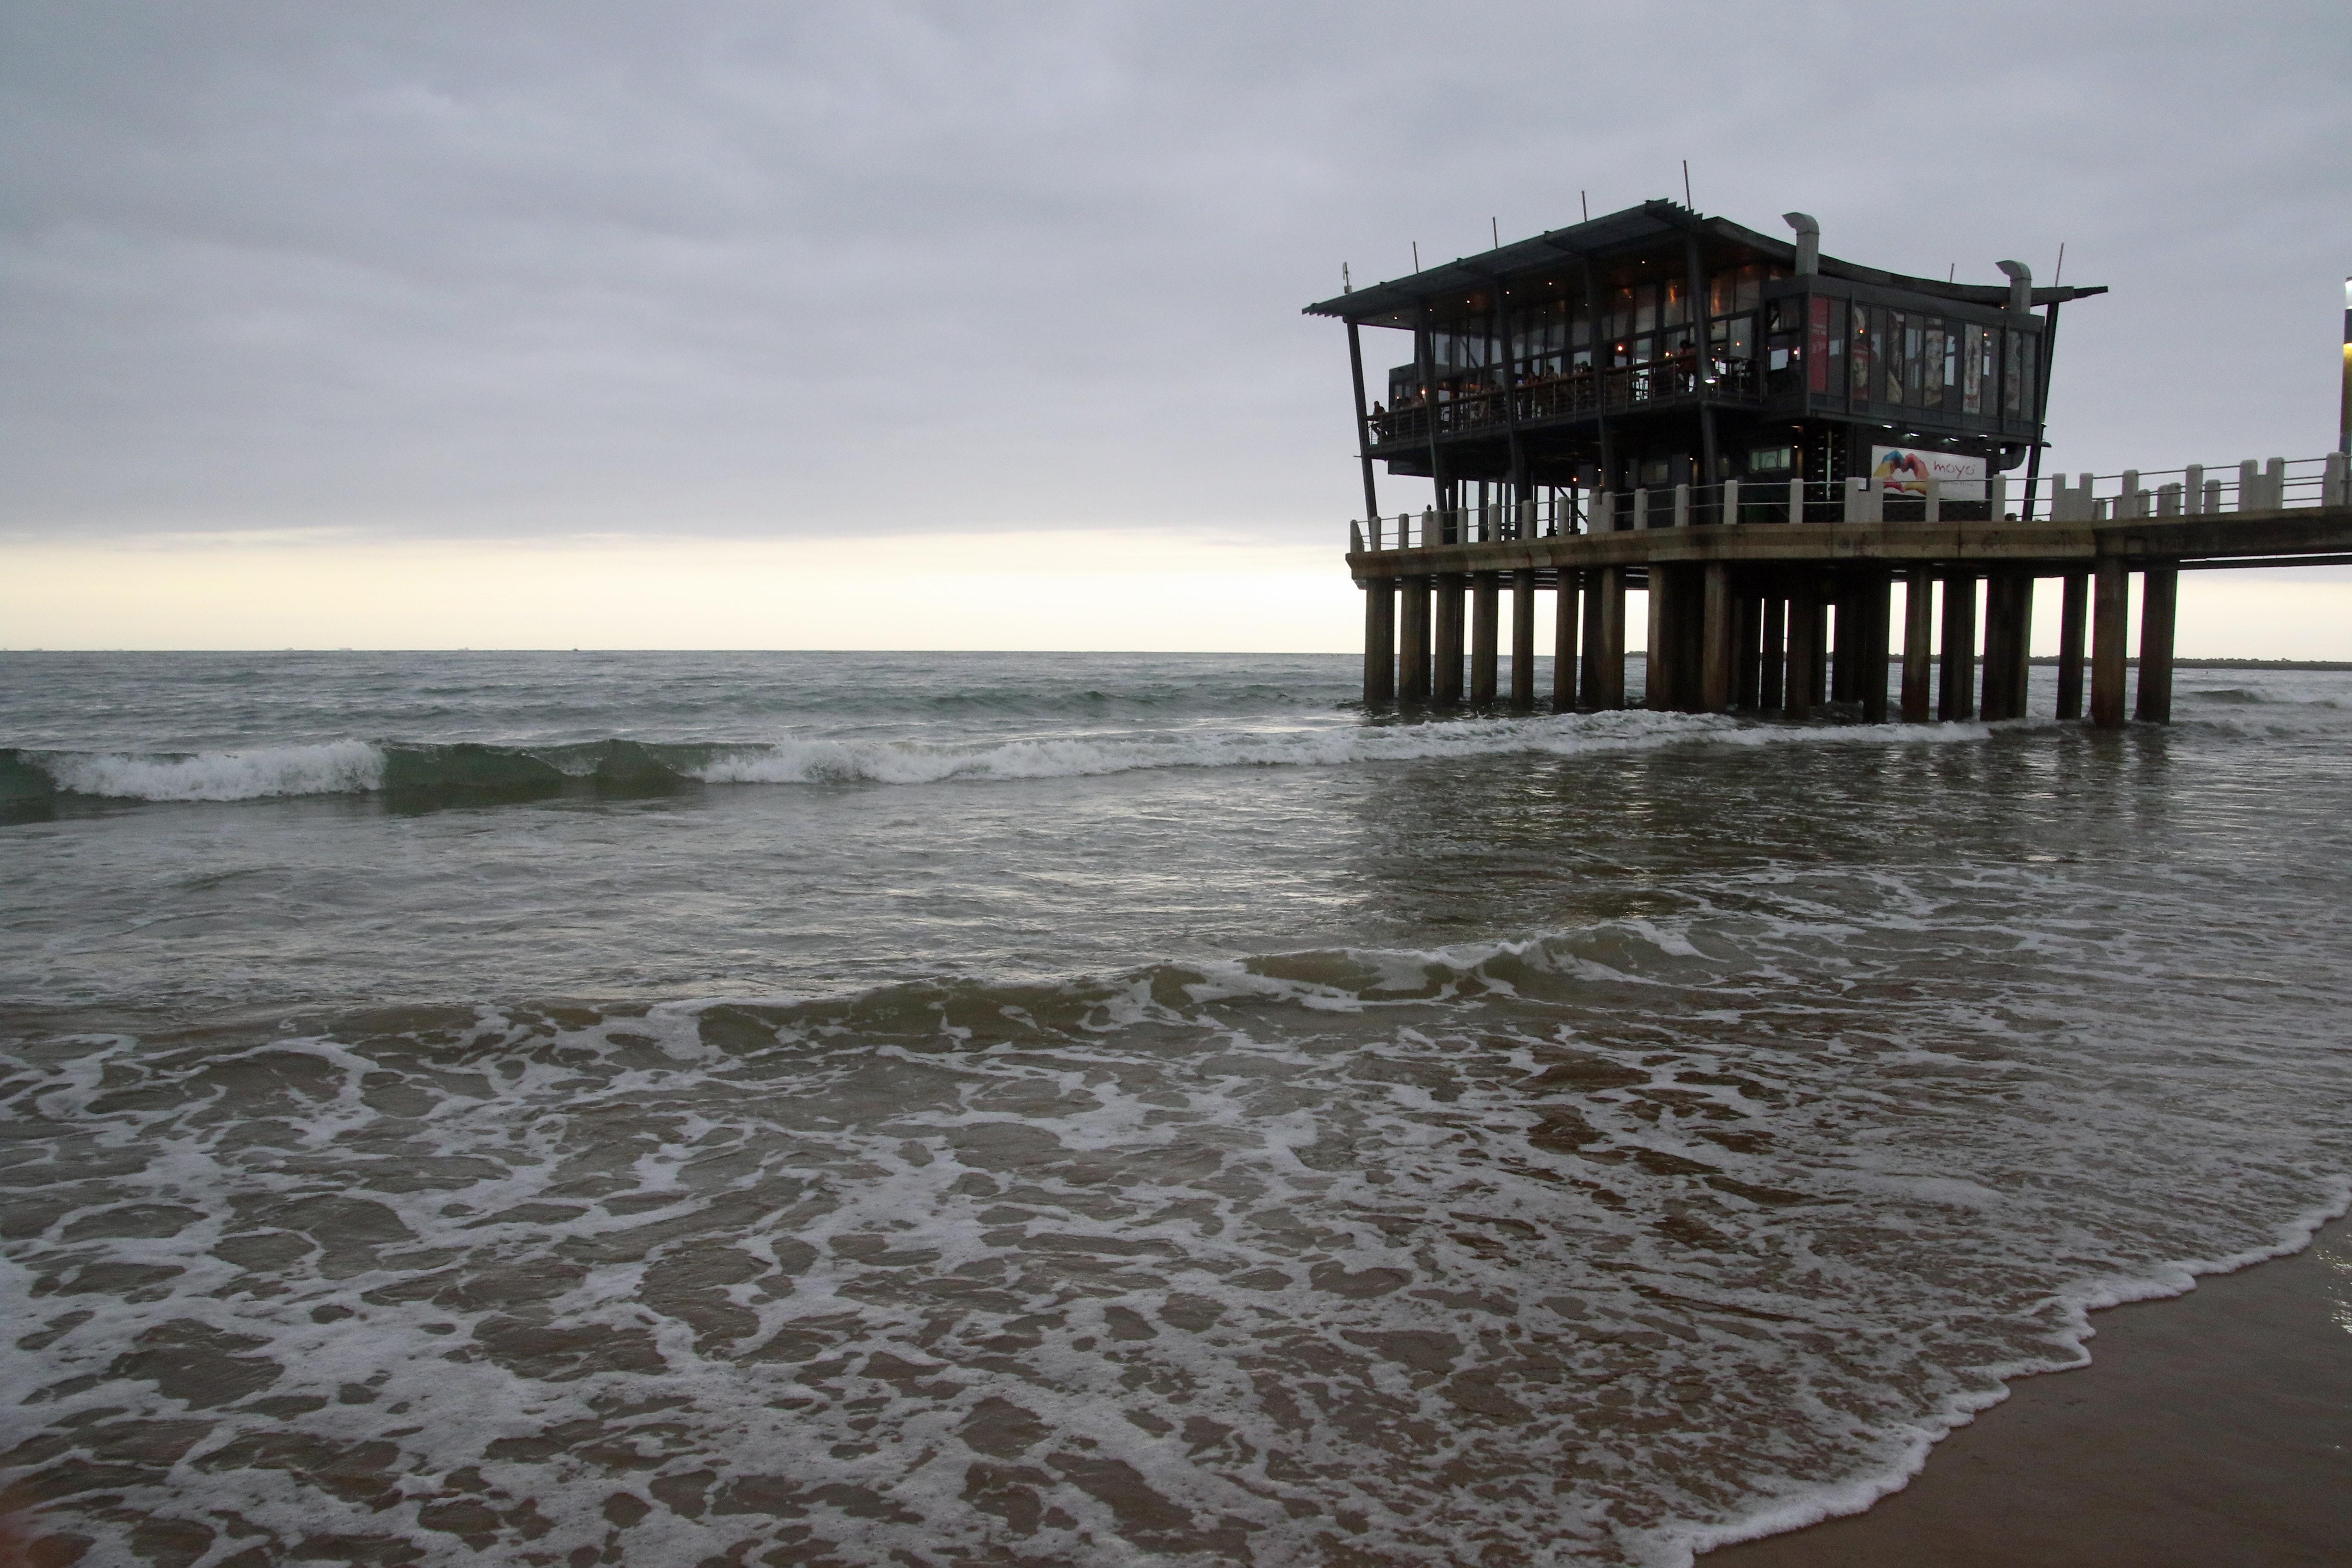 Big pier on the beach, Big pier on the beach